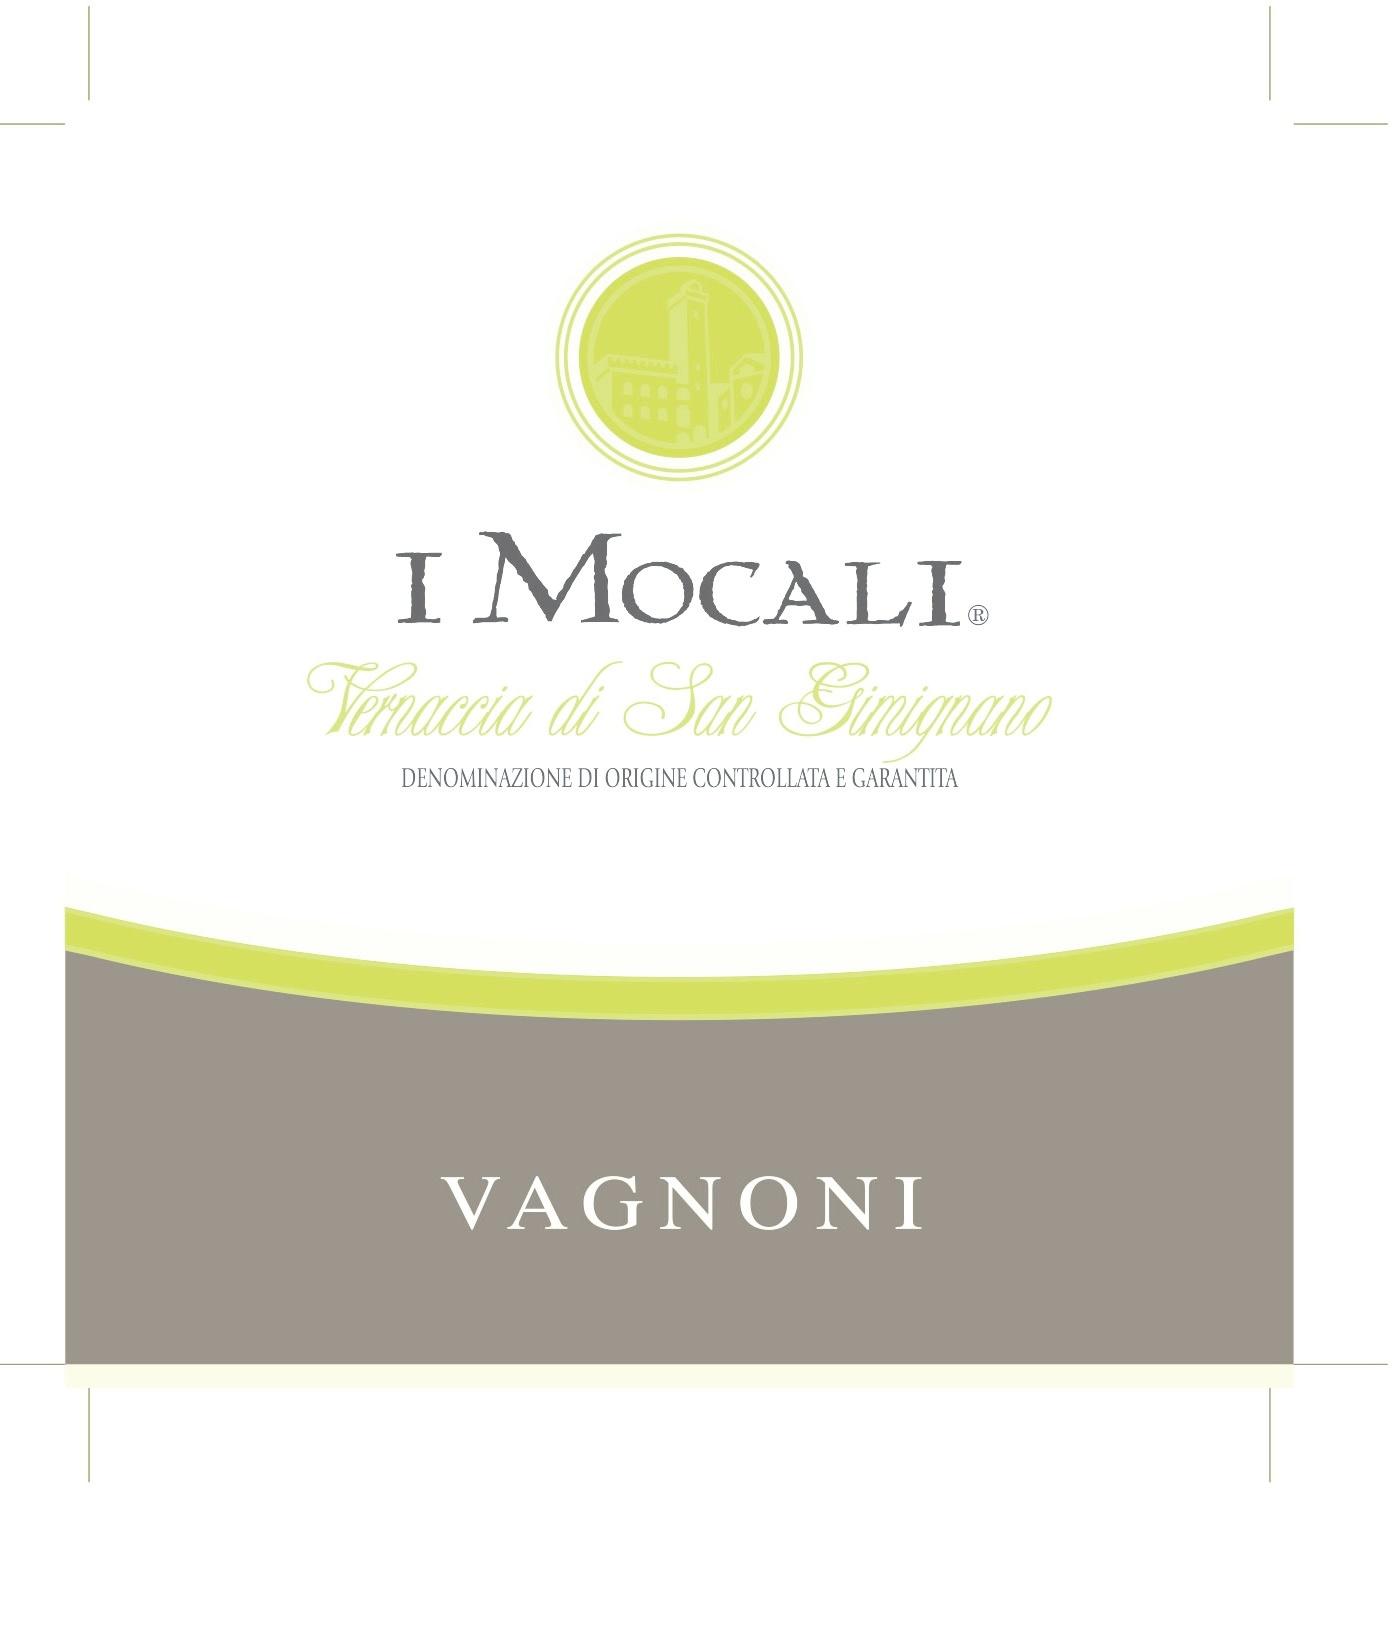 Fratelli Vagnoni, Vernaccia di San Gimignano Riserva I Mocali, 2017